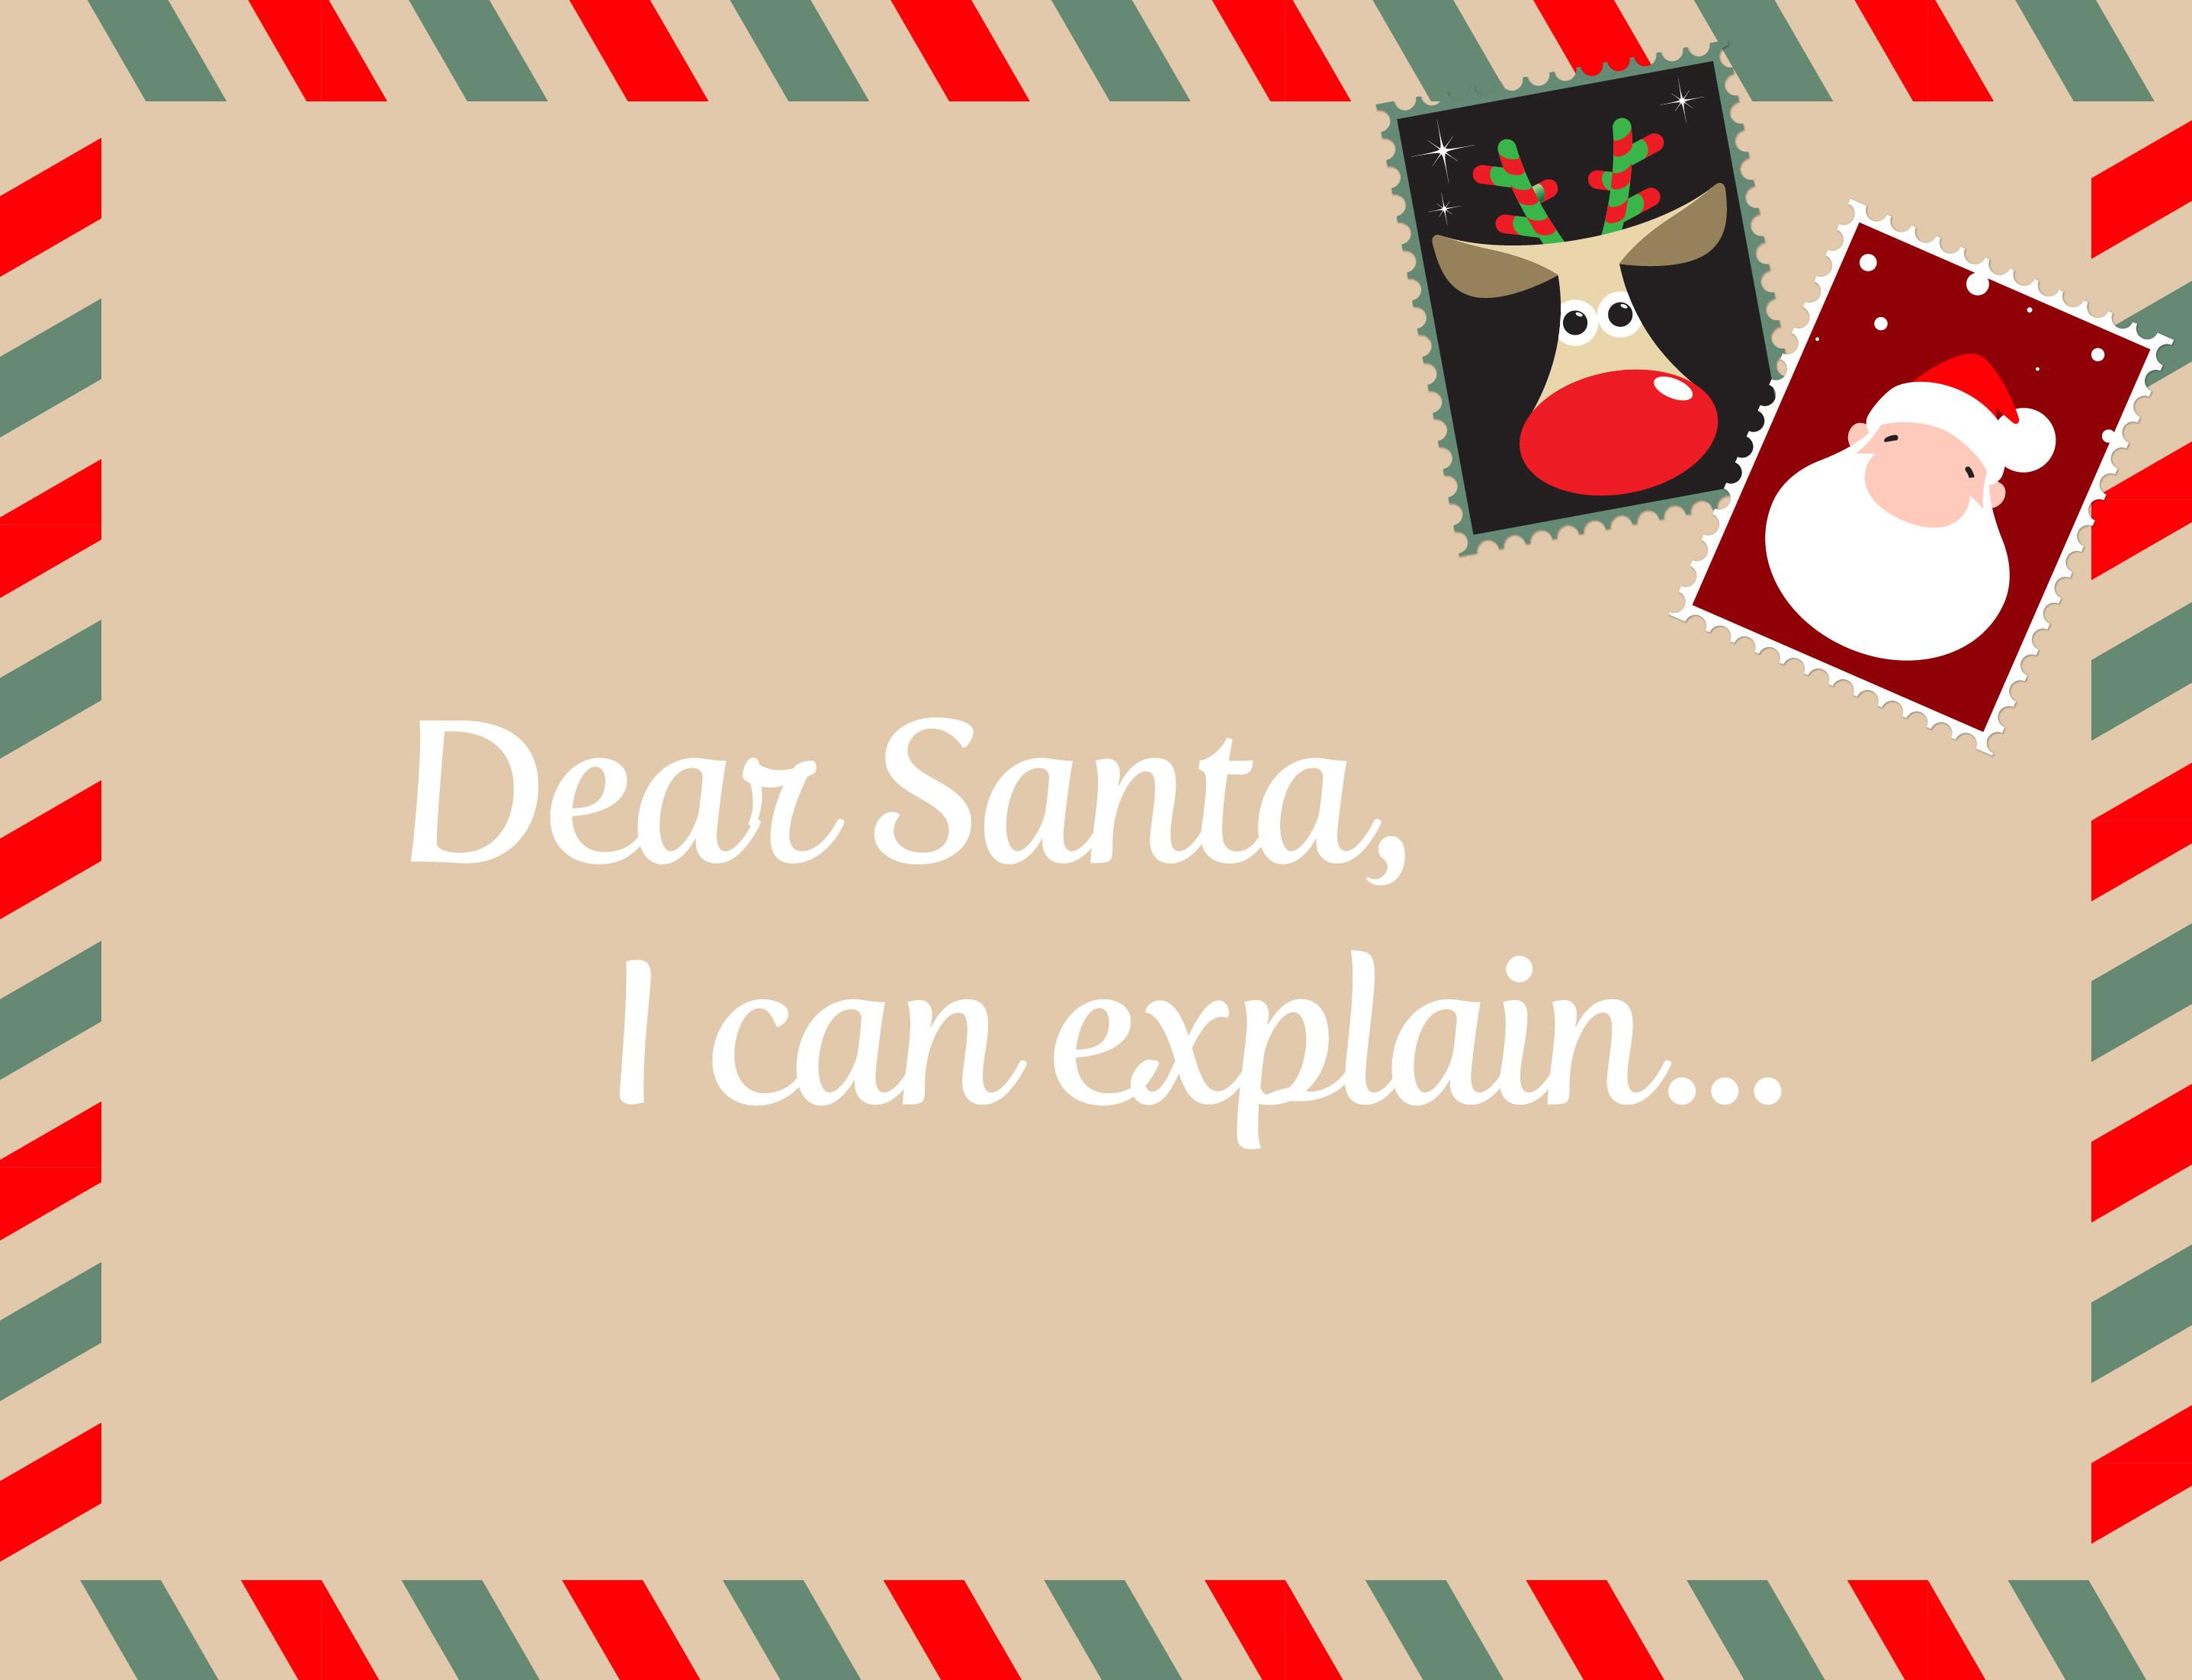 Dear Santa Blog Image